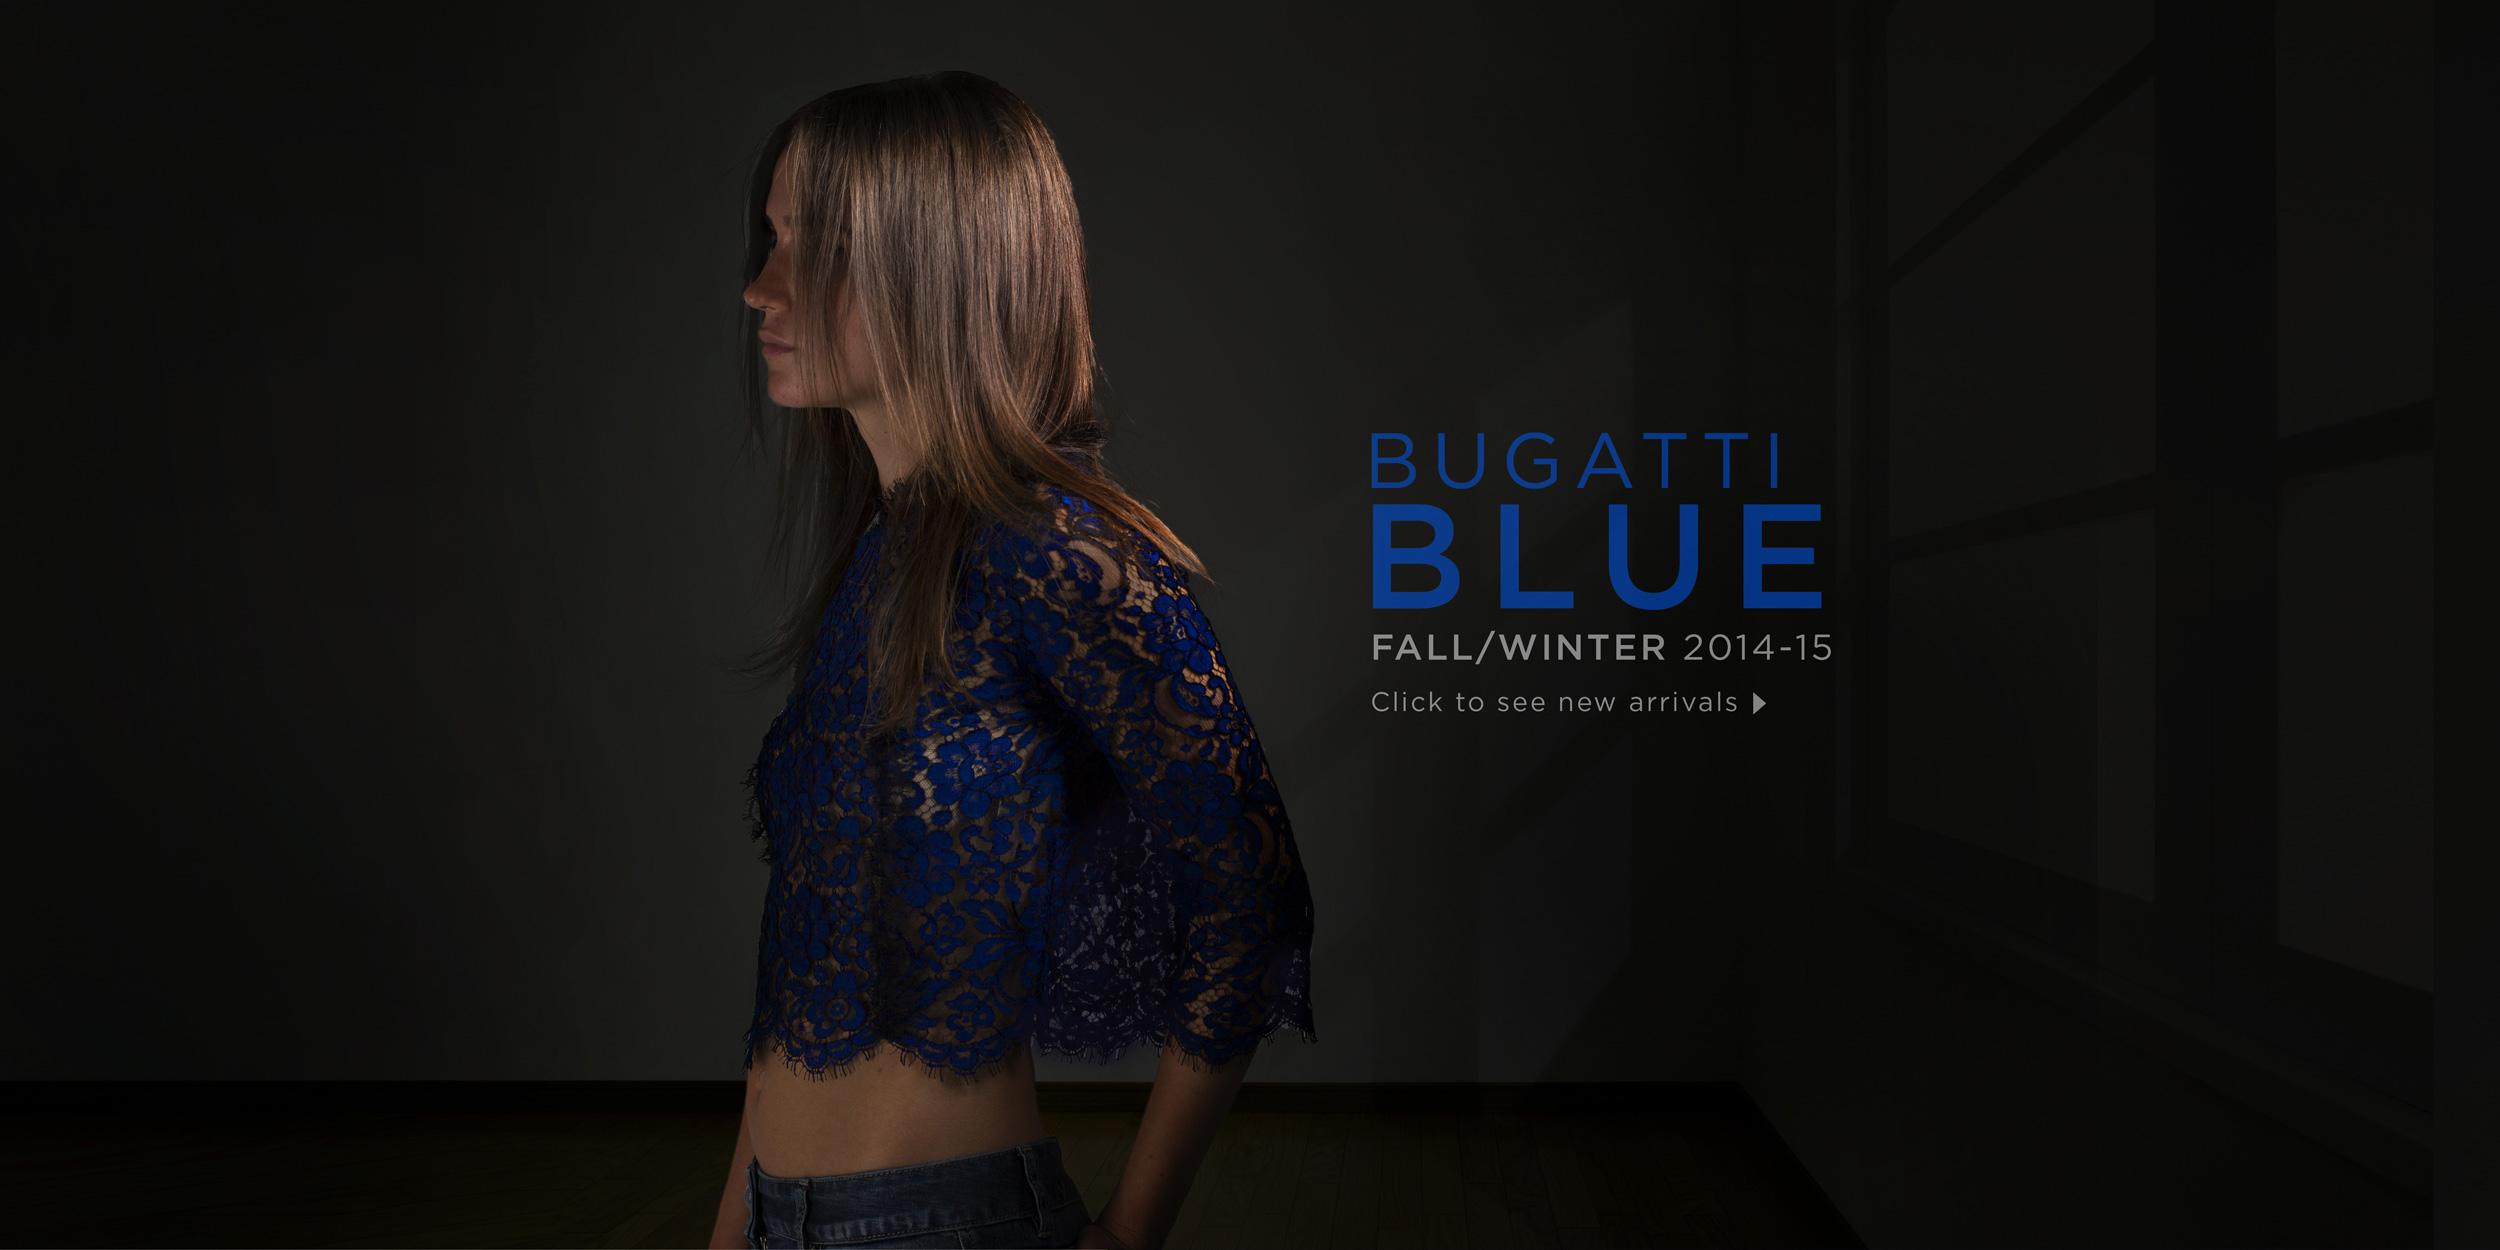 Bugatti_25.jpg